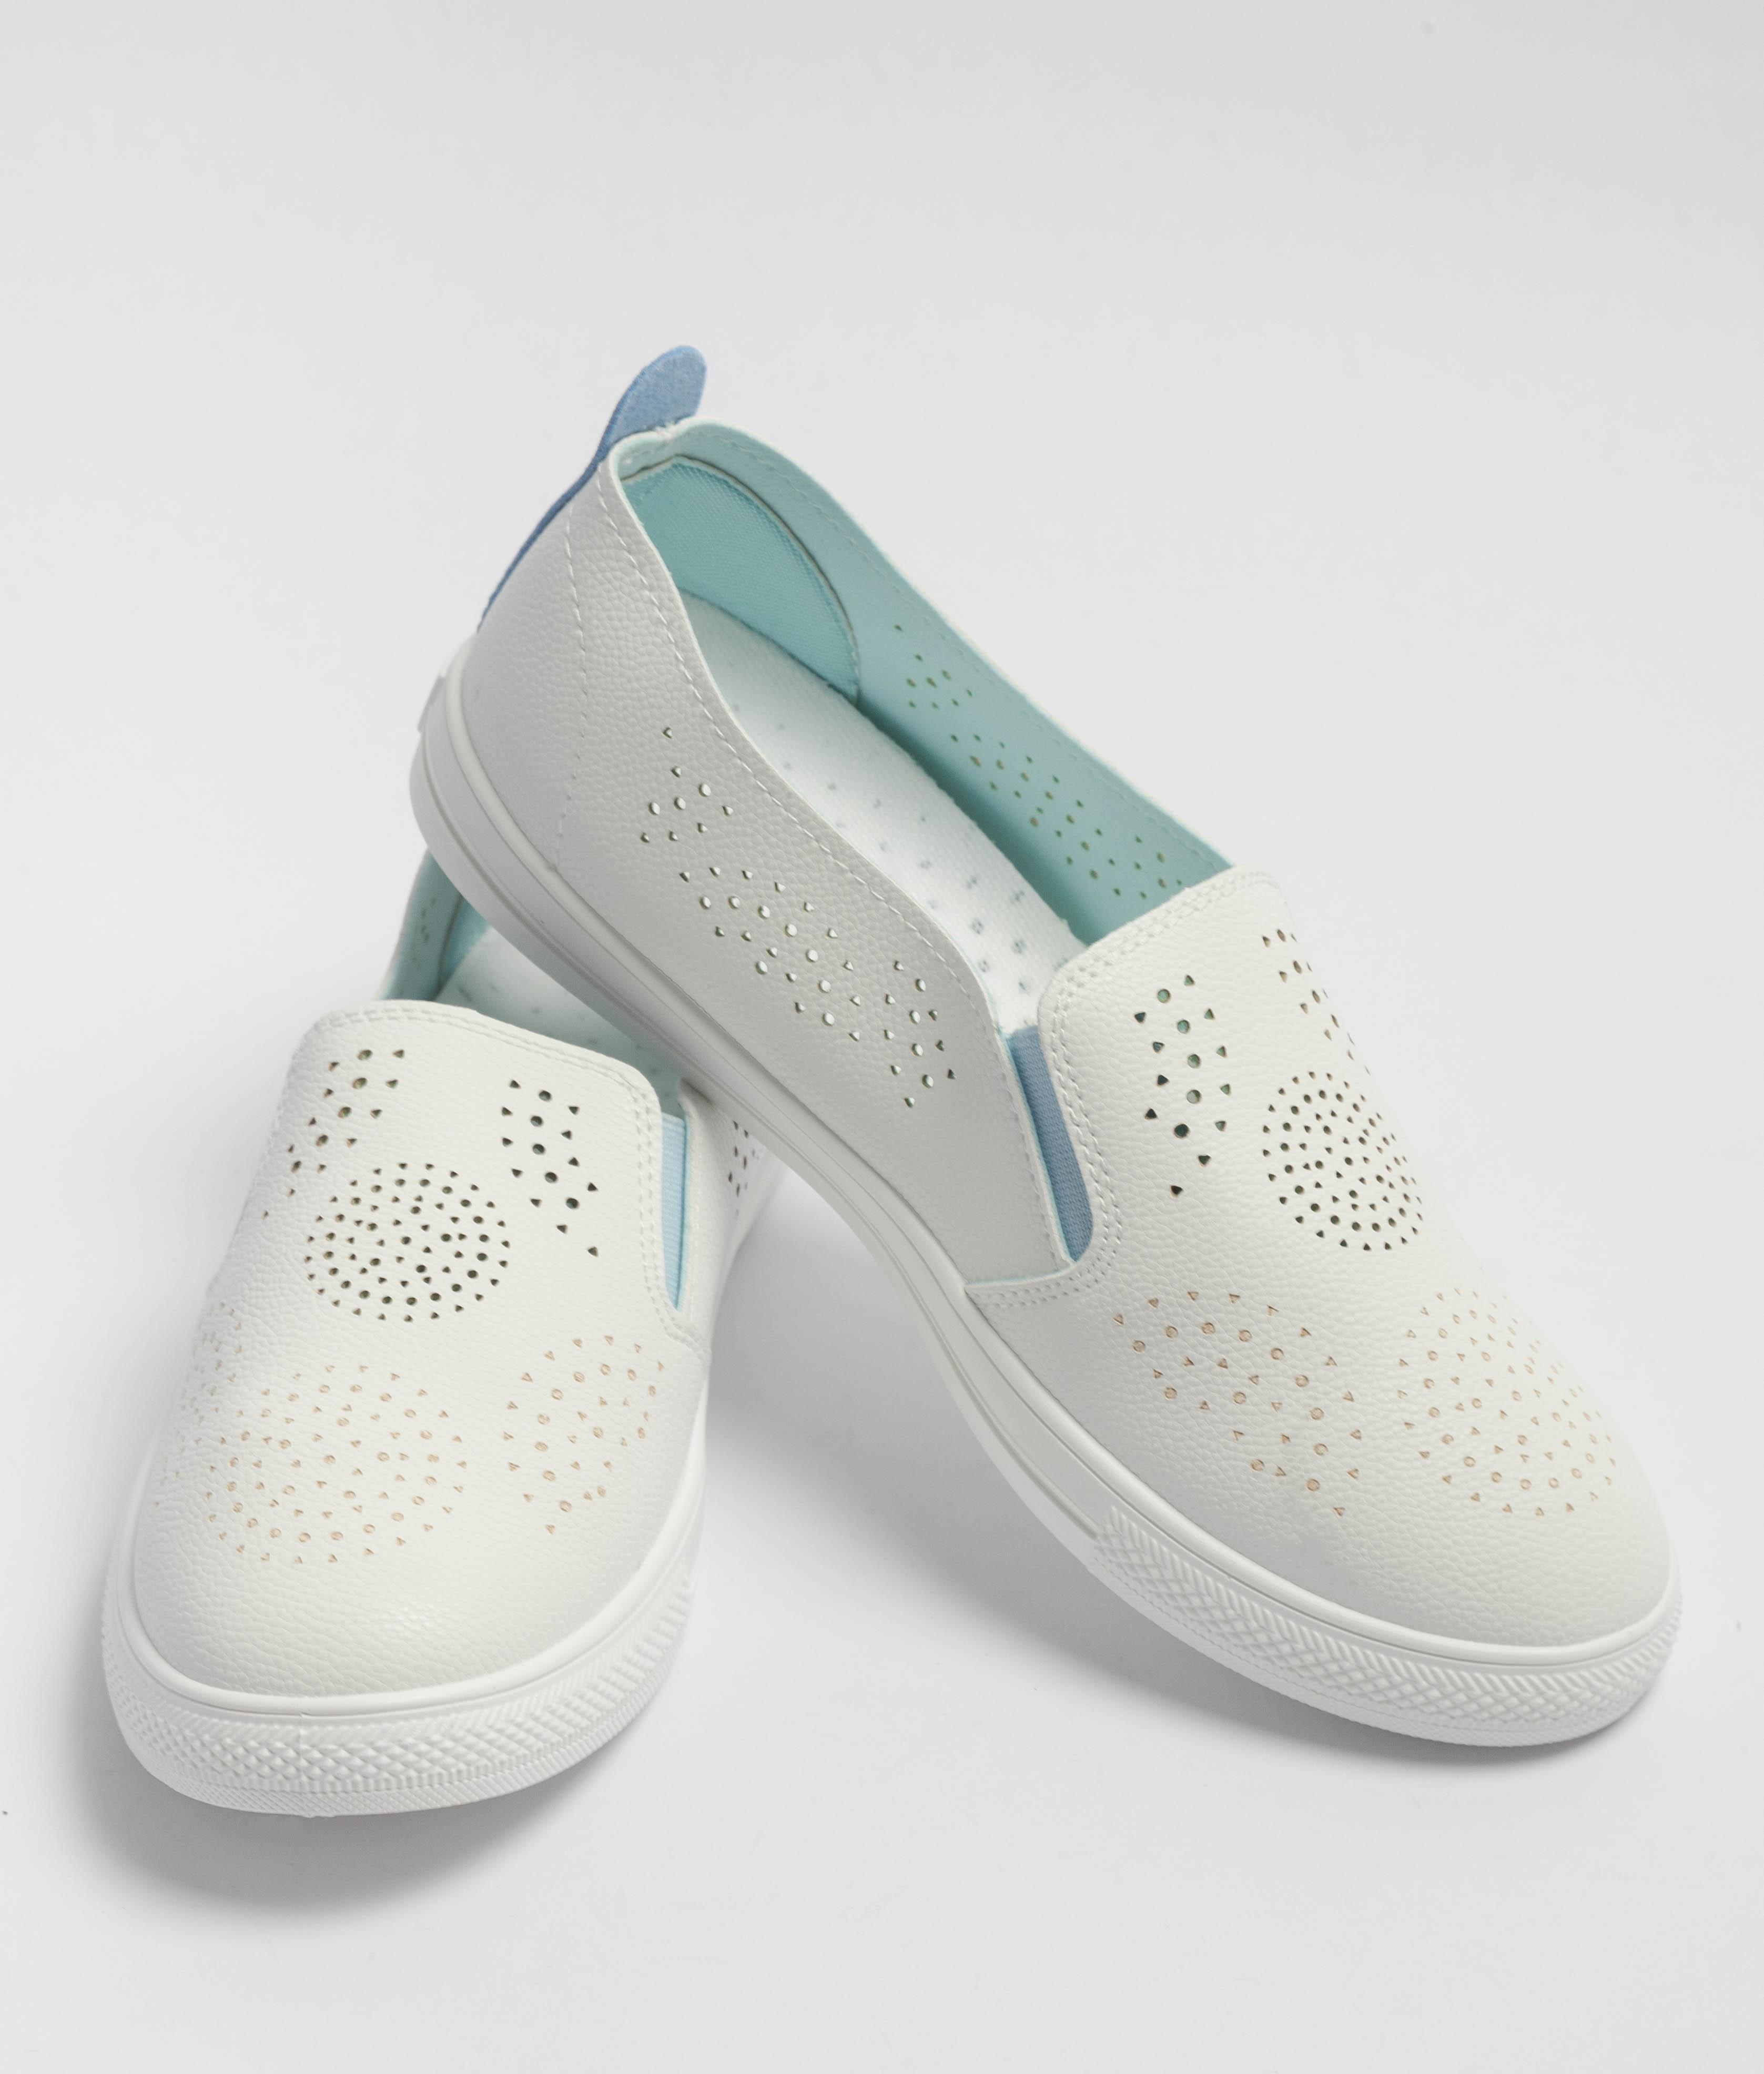 Sneakers Chery - Bleu Clair